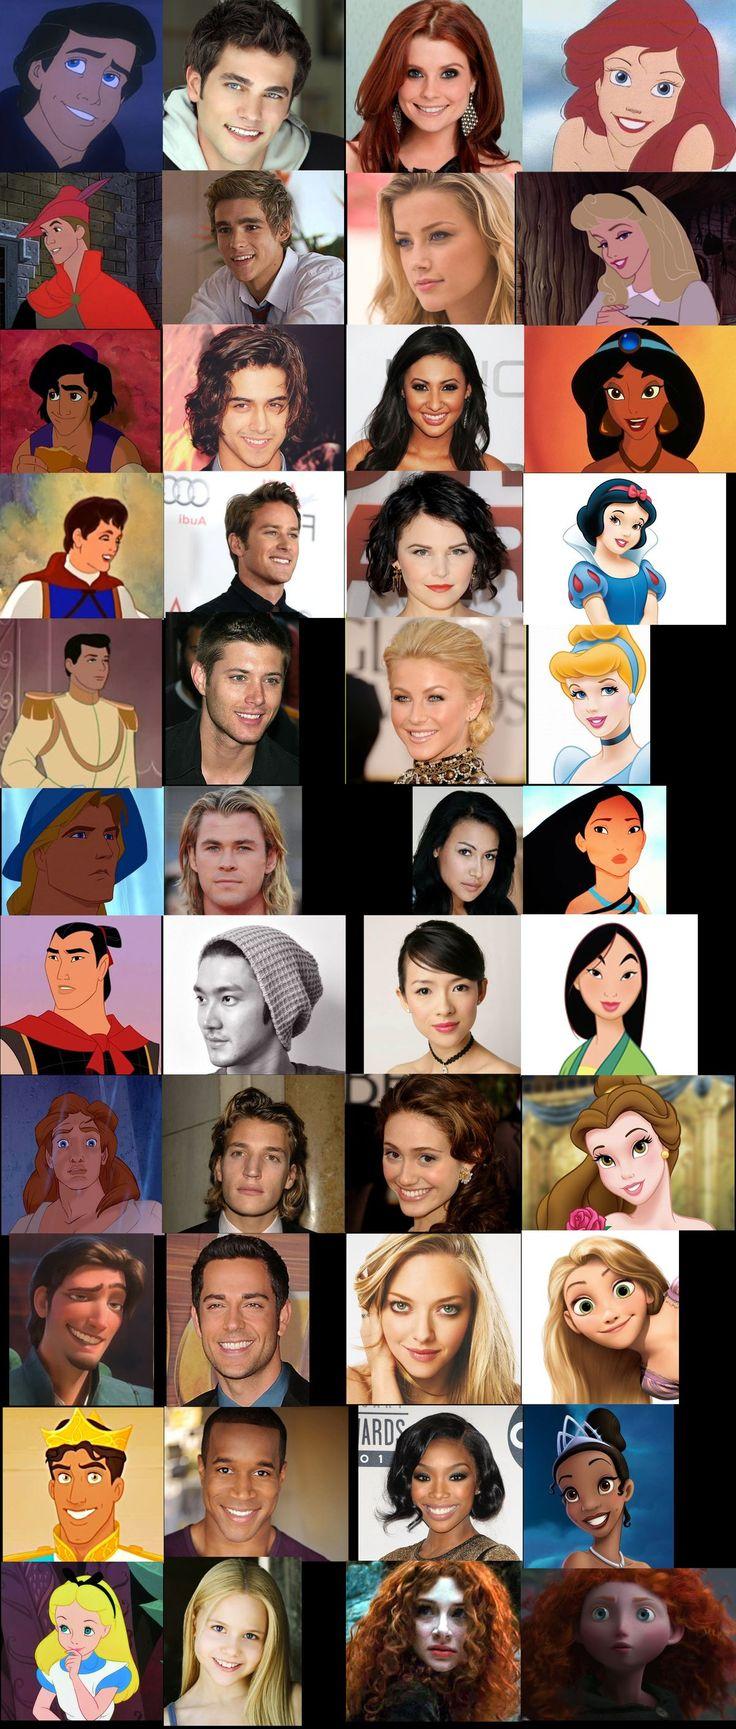 Pin by Rachael on Disney stuff | Real disney princesses ...